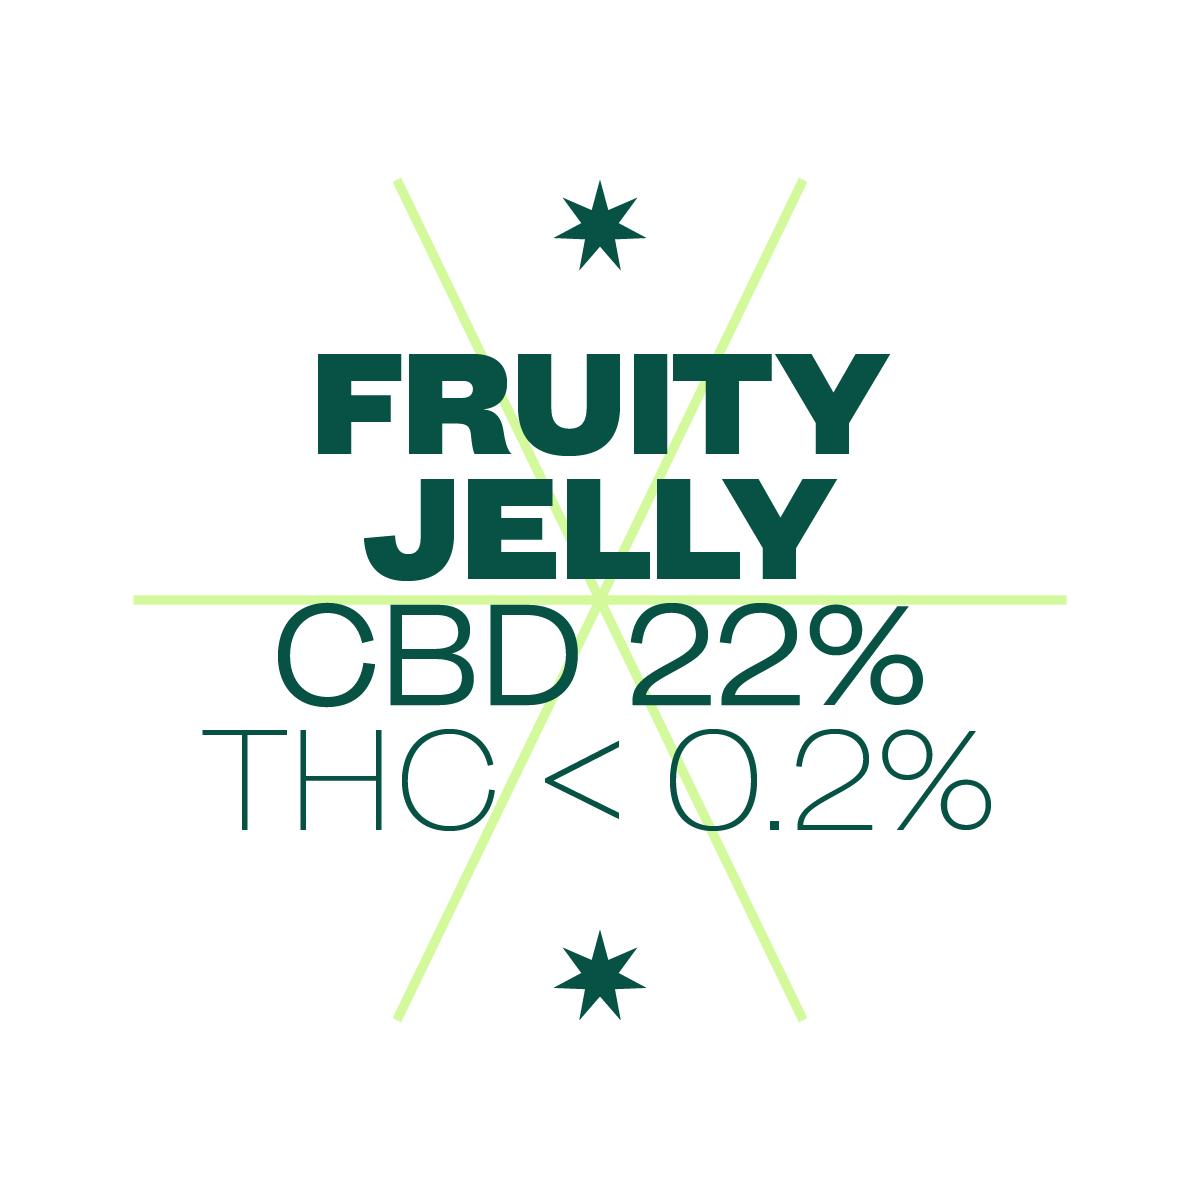 ligne verte bandeaux fruity jelly % site px px